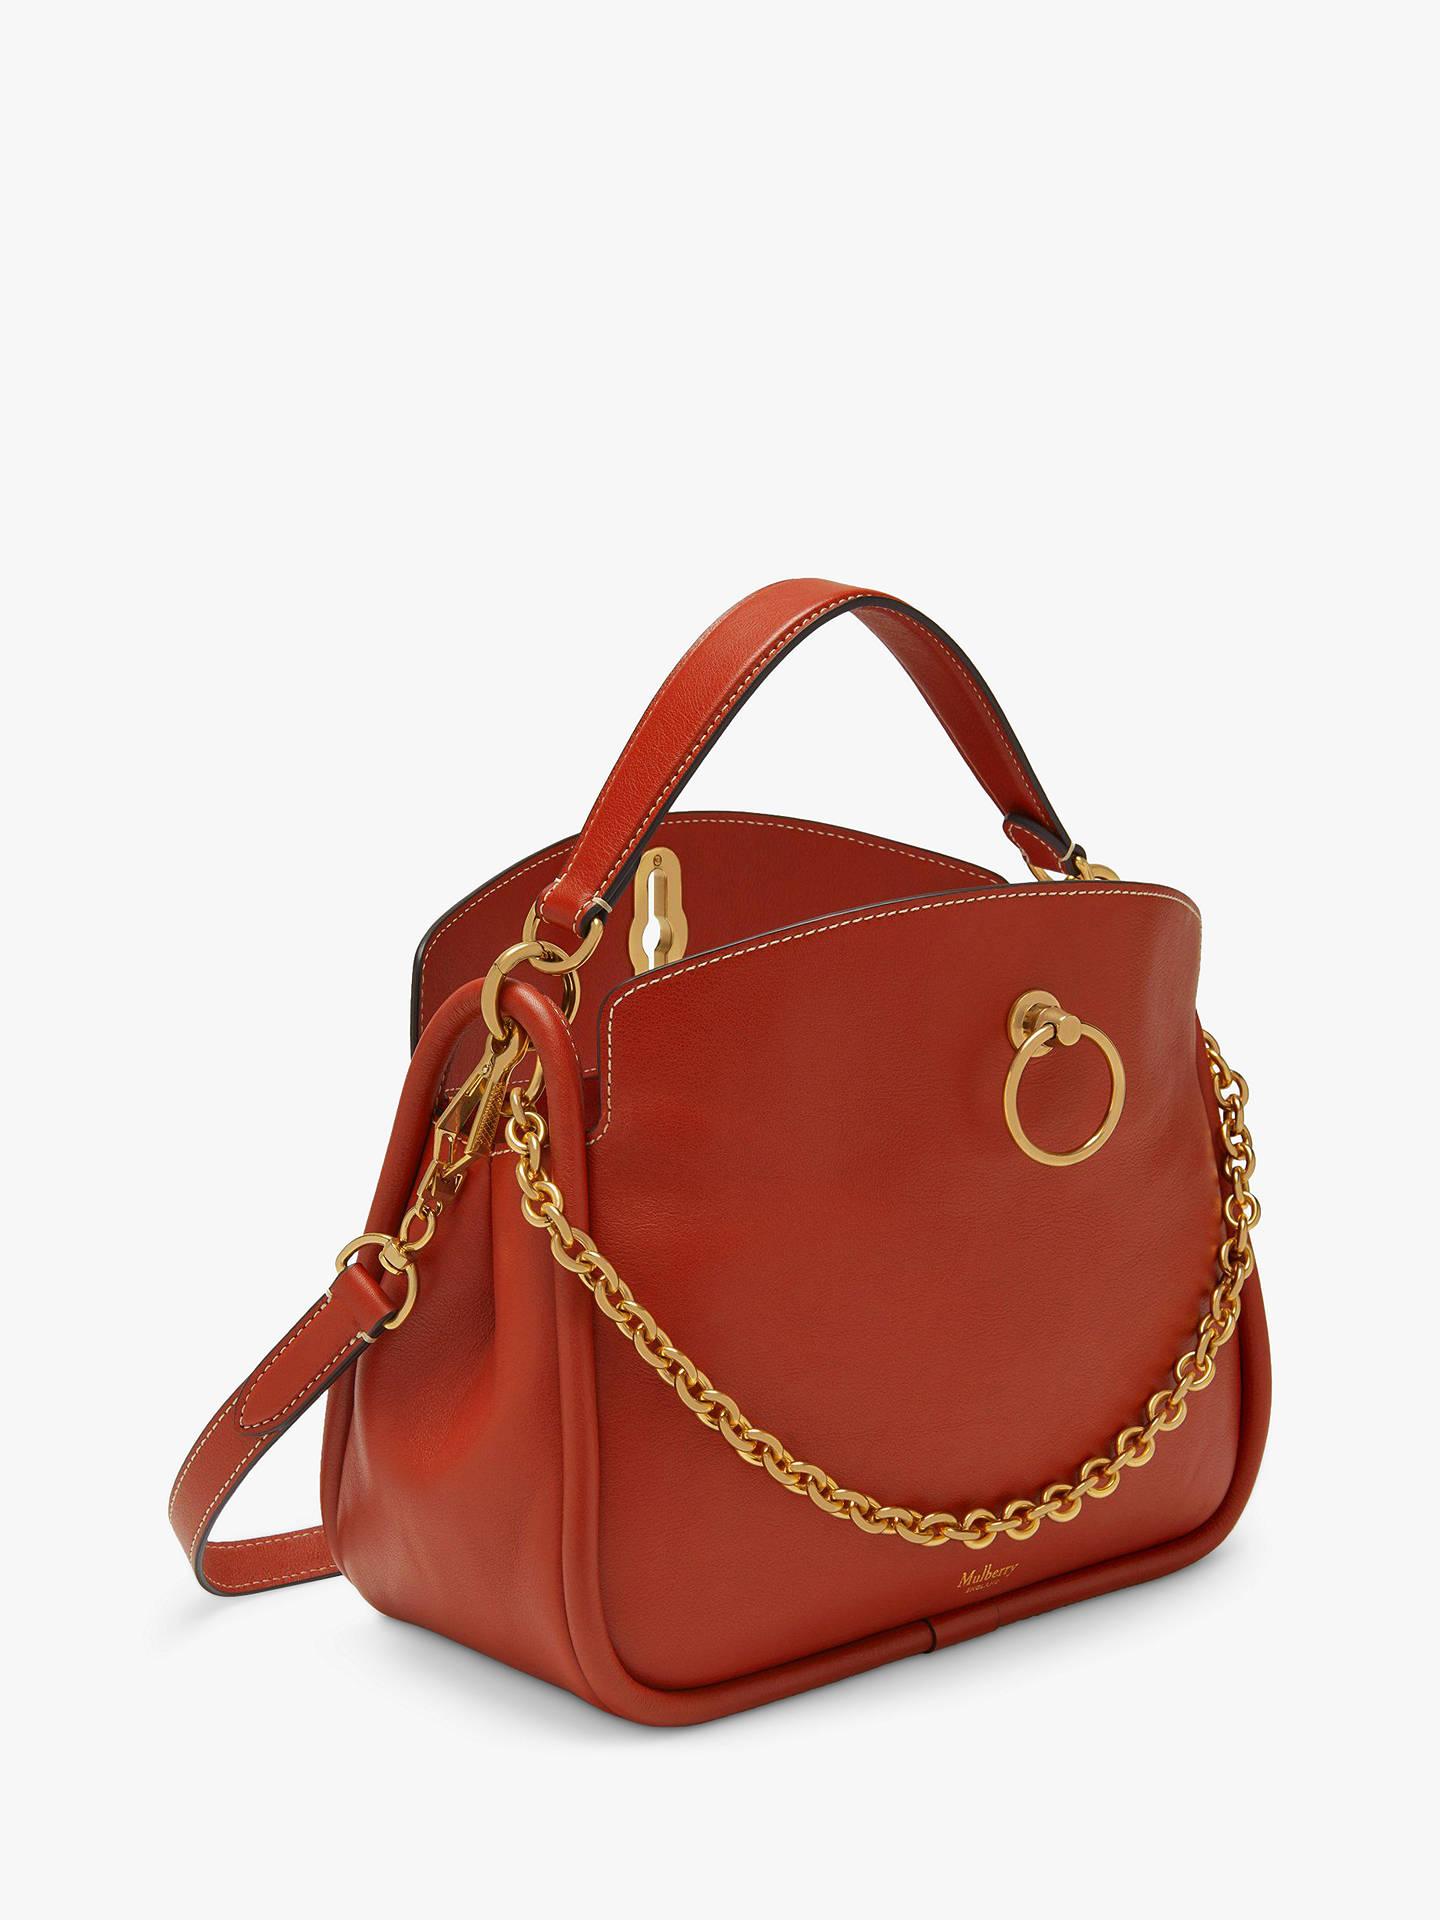 946e912ea9 Mulberry Small Leighton Silky Calf Leather Shoulder Bag, Rust